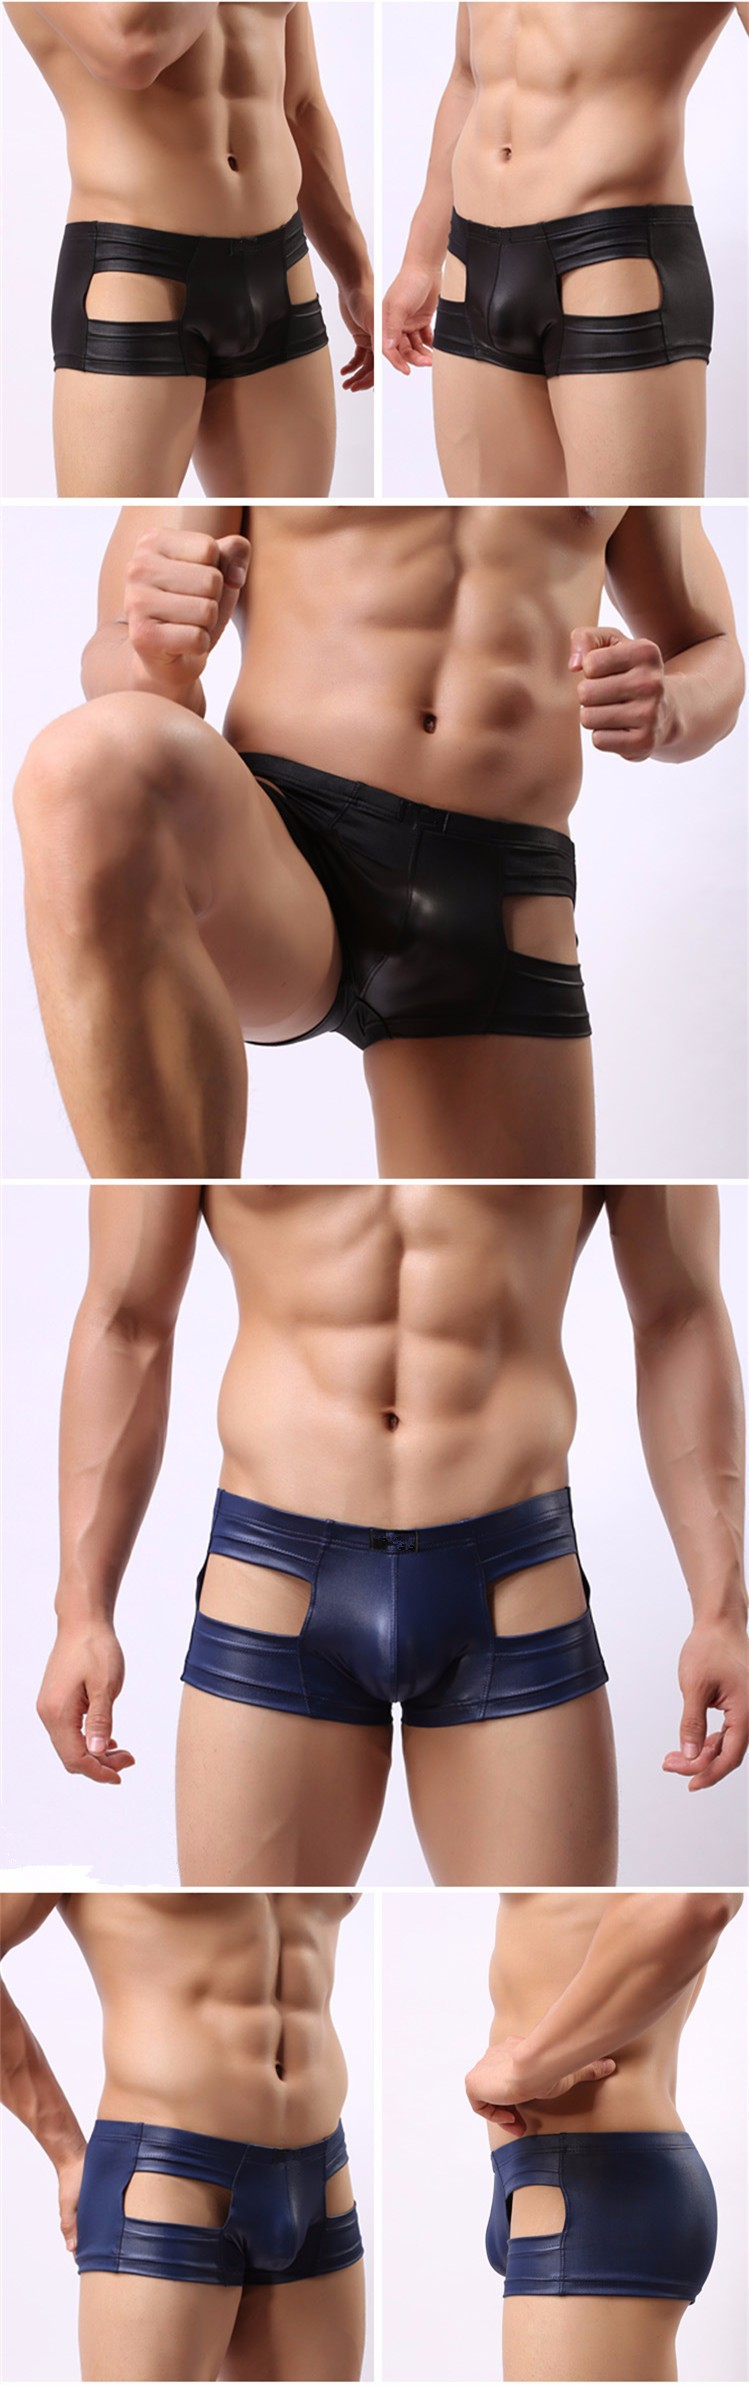 75a4769018df Men Sexy Tight Good Material Leather Panties Japanned Leather Shorts For Man  Beach Summer Underwear Swim Short GWB085. HTB1ZDSEHpXXXXcqaXXXq6xXFXXXn